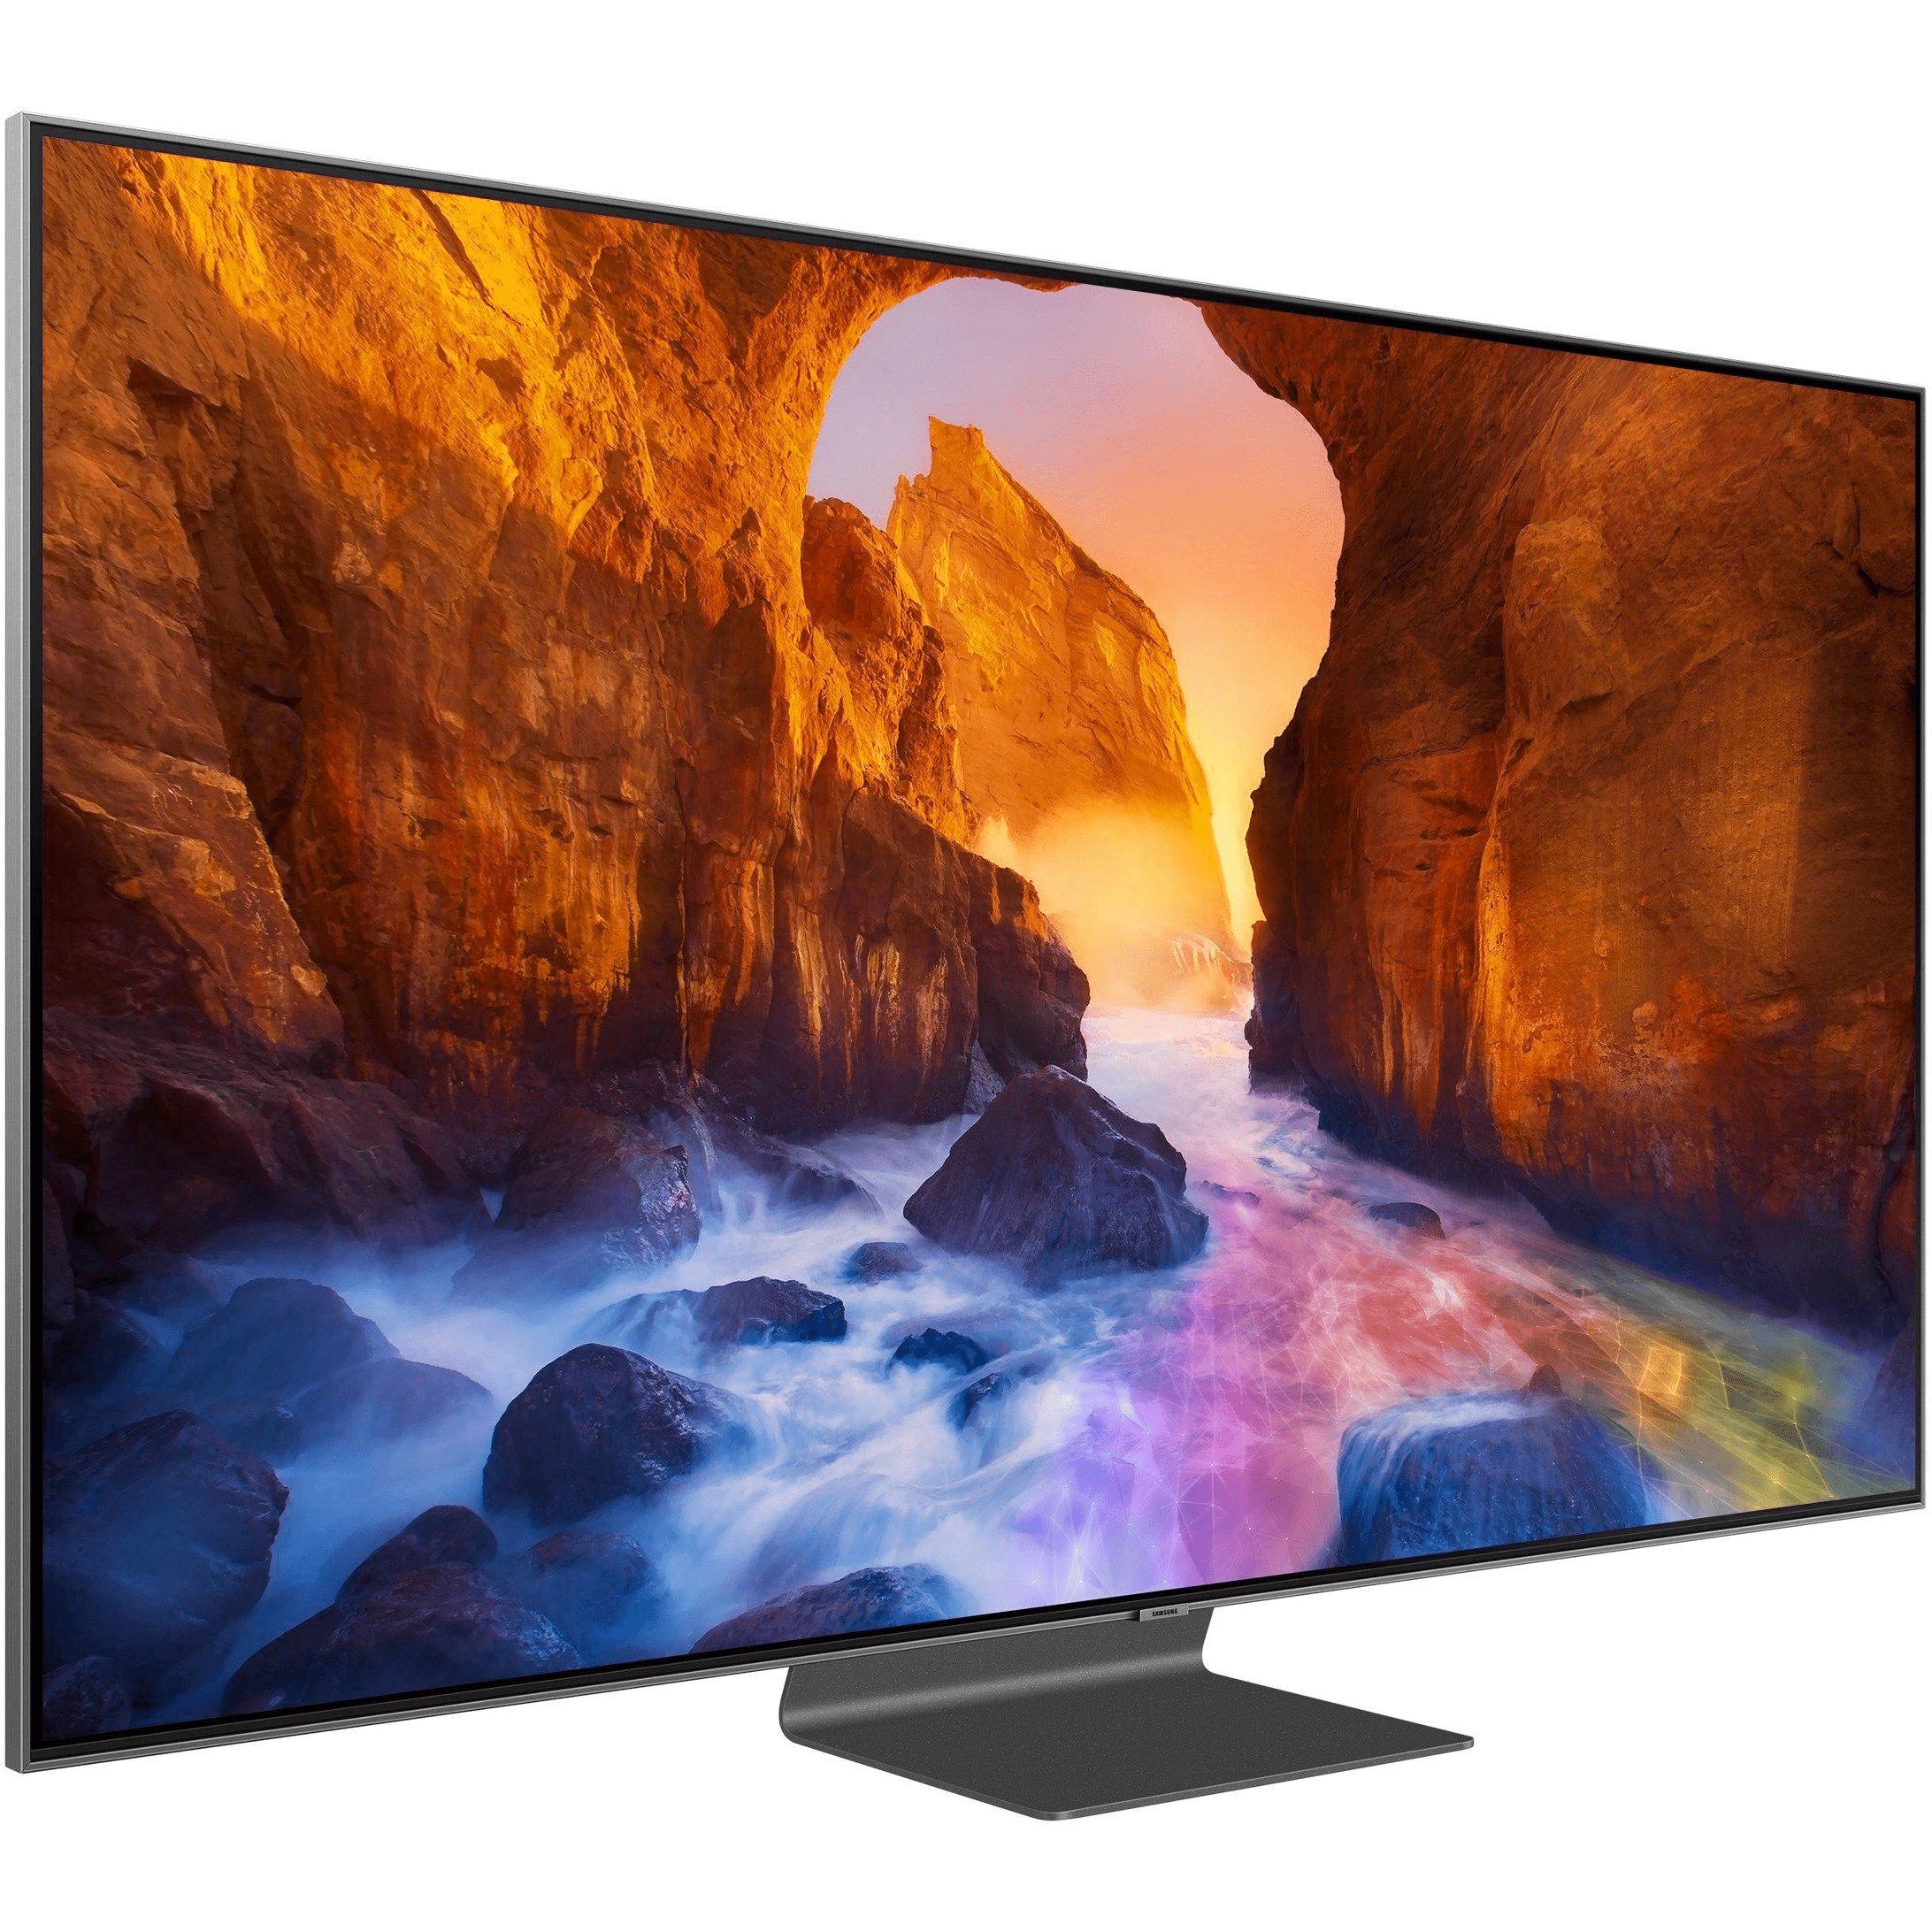 "Samsung 55"" Q90R (QE55Q90R) Flagship QLED 4K HDR Smart TV + 2 Free 4K Blu-ray Films + 5 yrs warranty - £1199 (Stand +£49) @ PRC Direct"